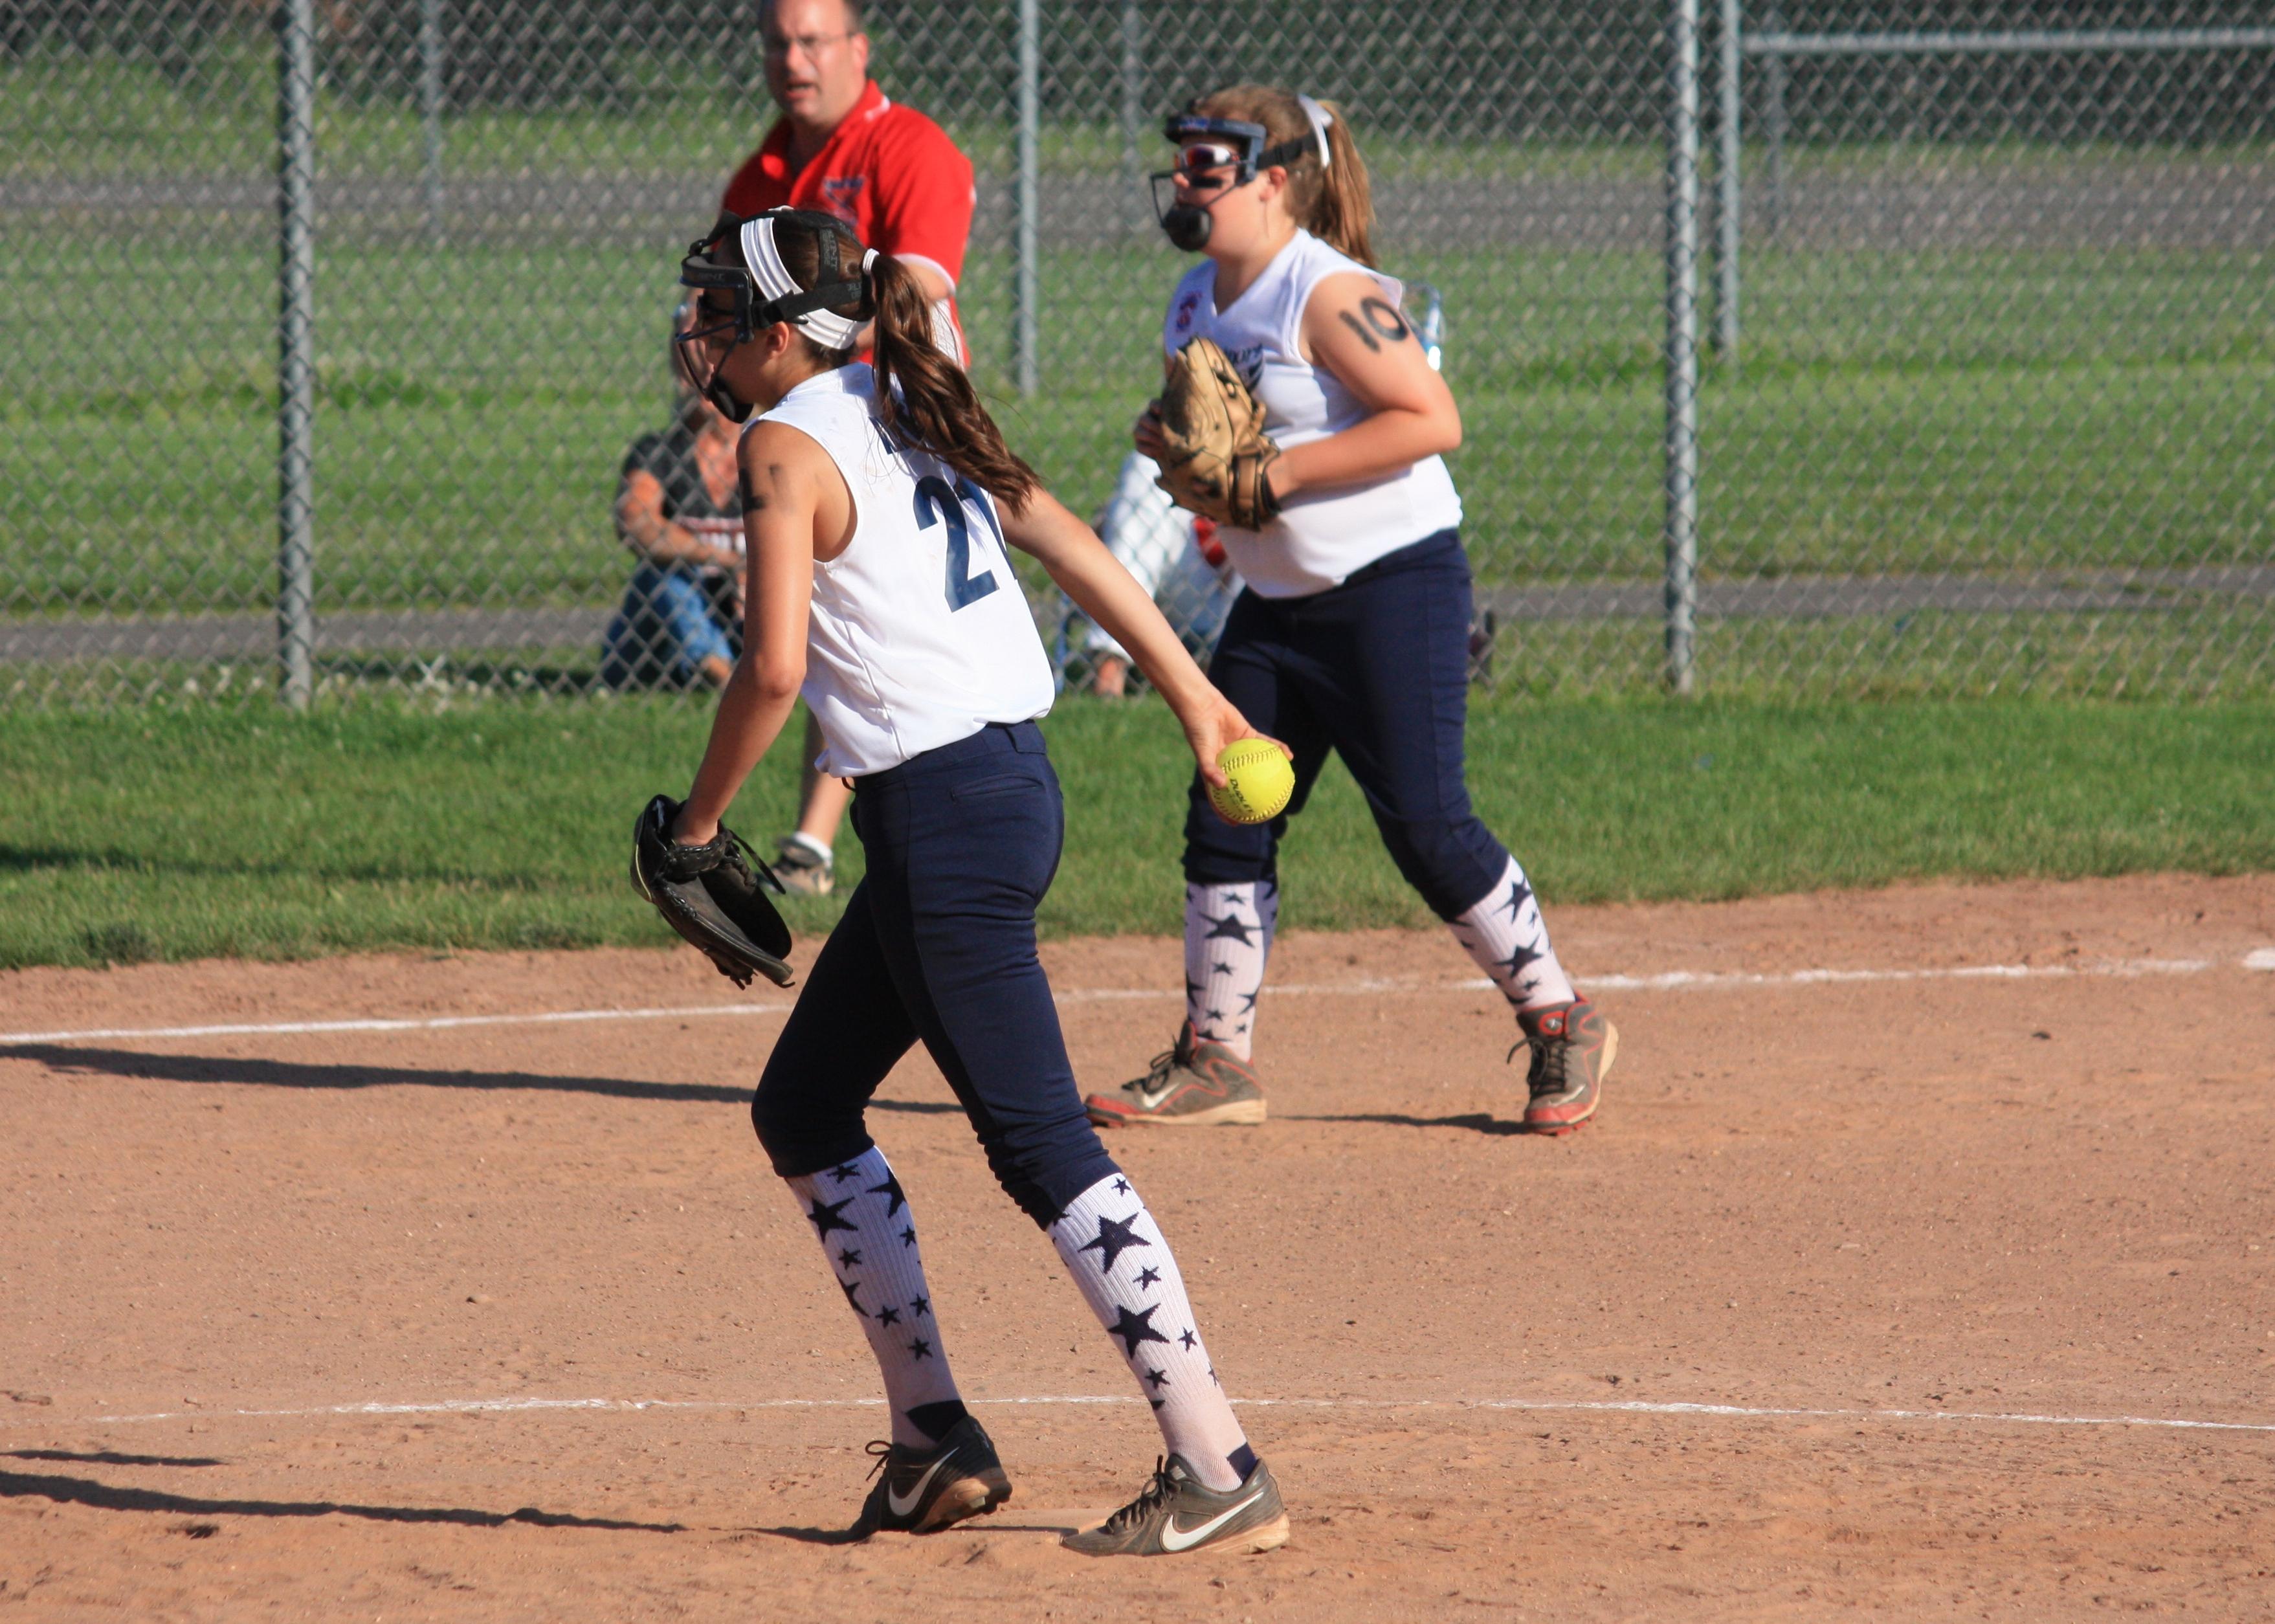 Sofia Alfero pitches for Westport and Emily Stone plays third base.